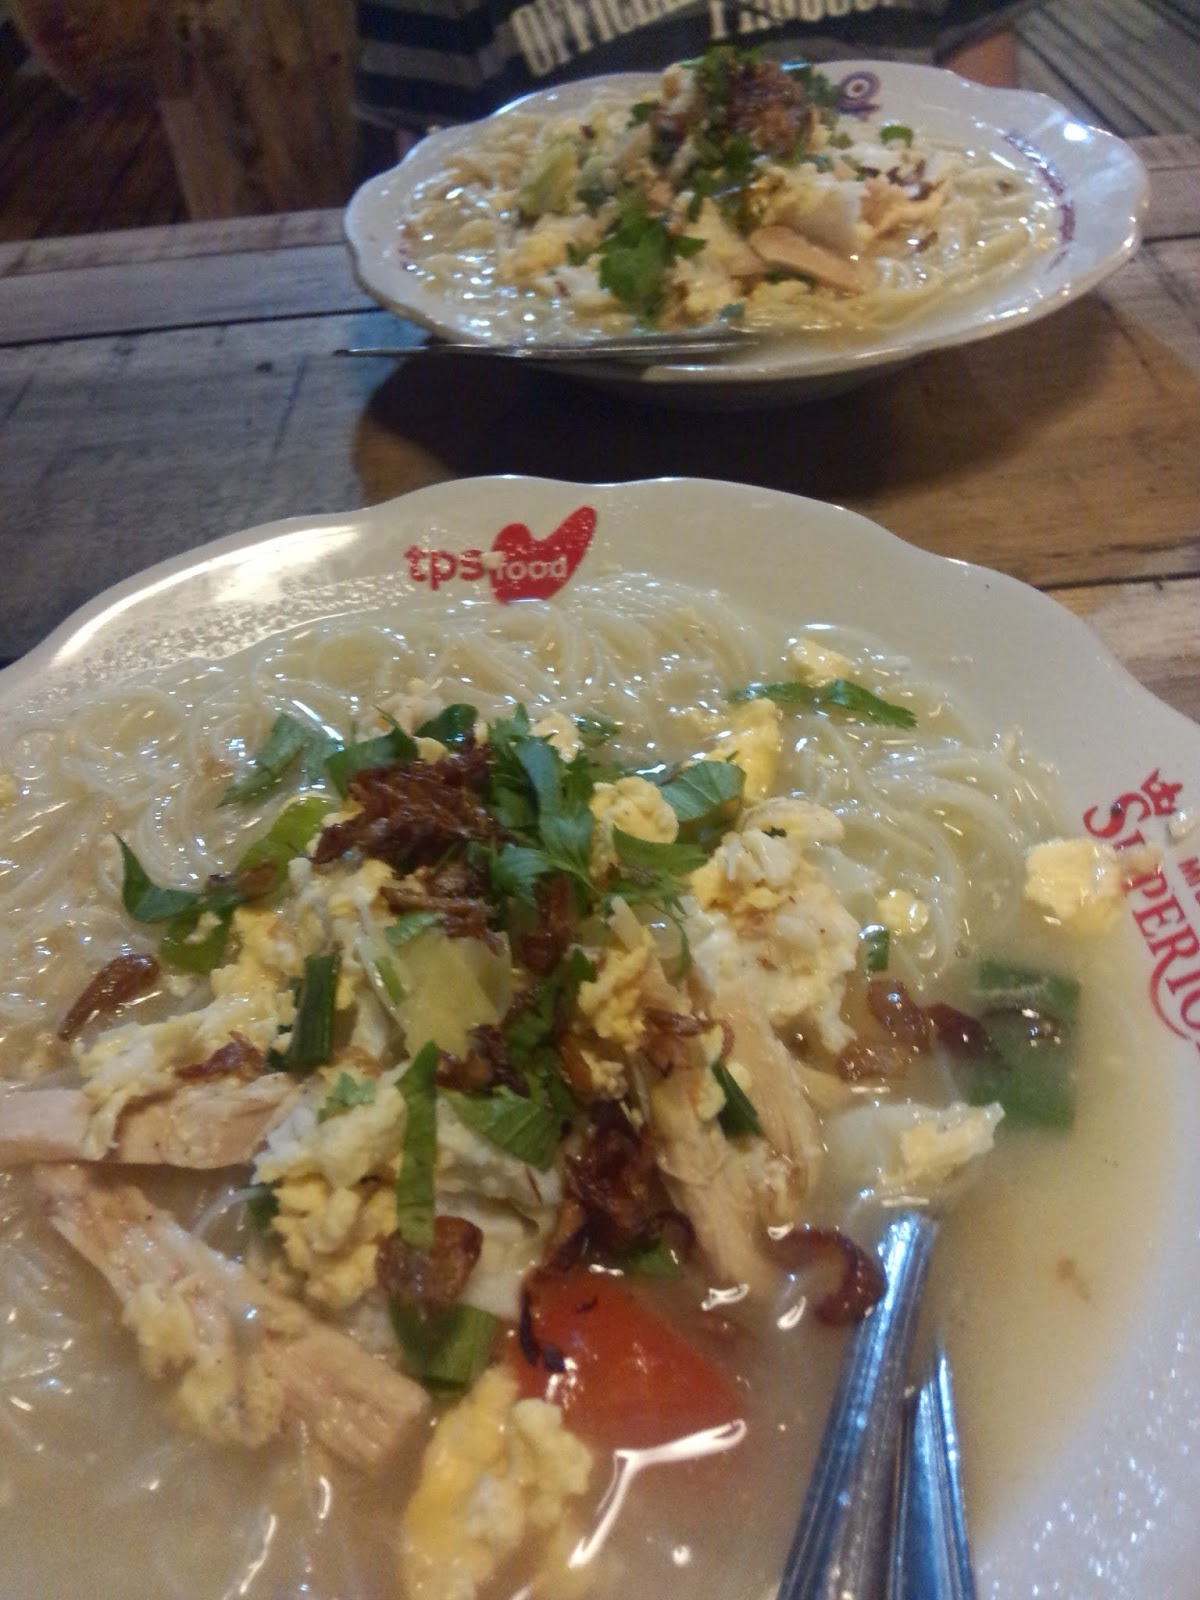 57 Kuliner Malam Jogja Yang Terkenal Enak Dan Murah Meriah - Aneka Wisata